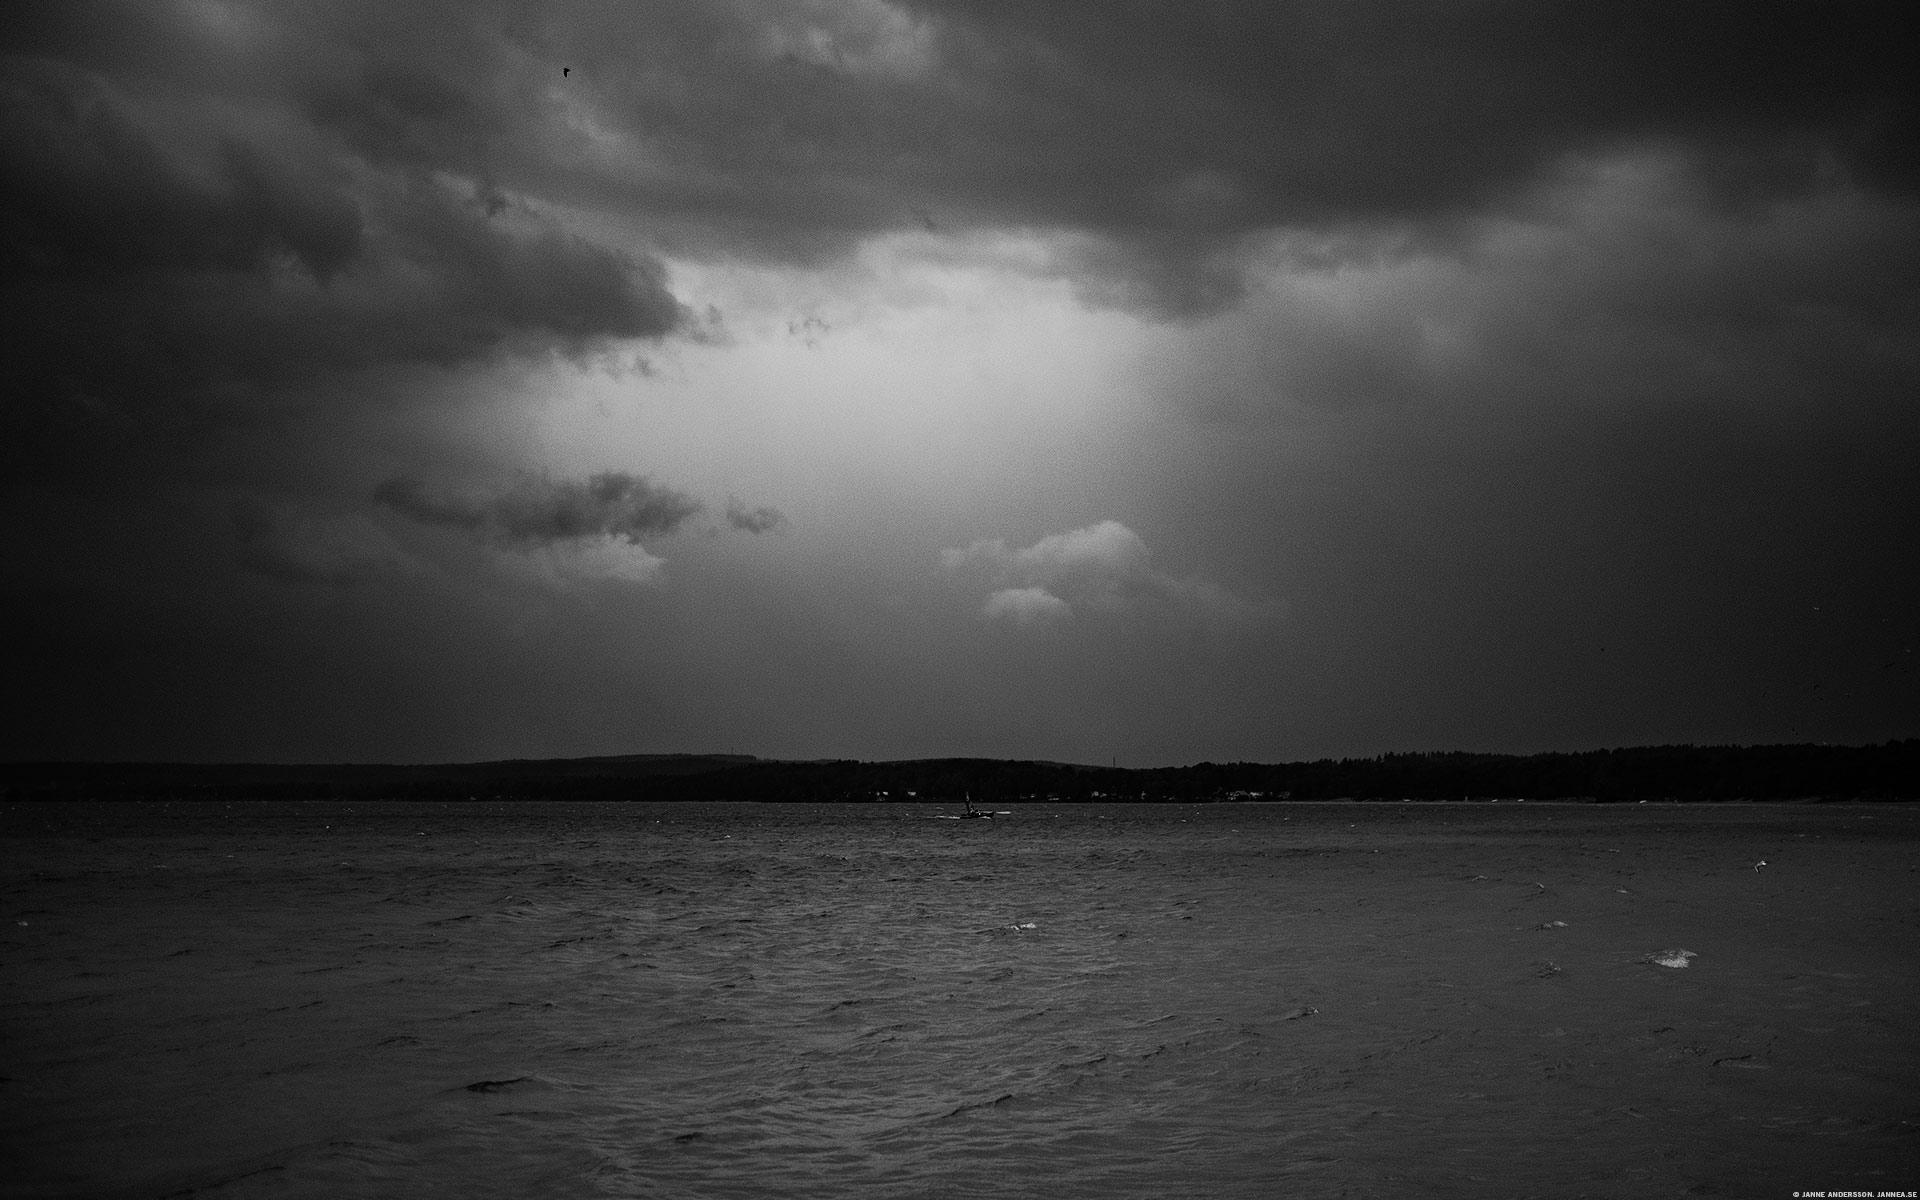 Svartvitt gråväder, regn och blåst |©Janne A